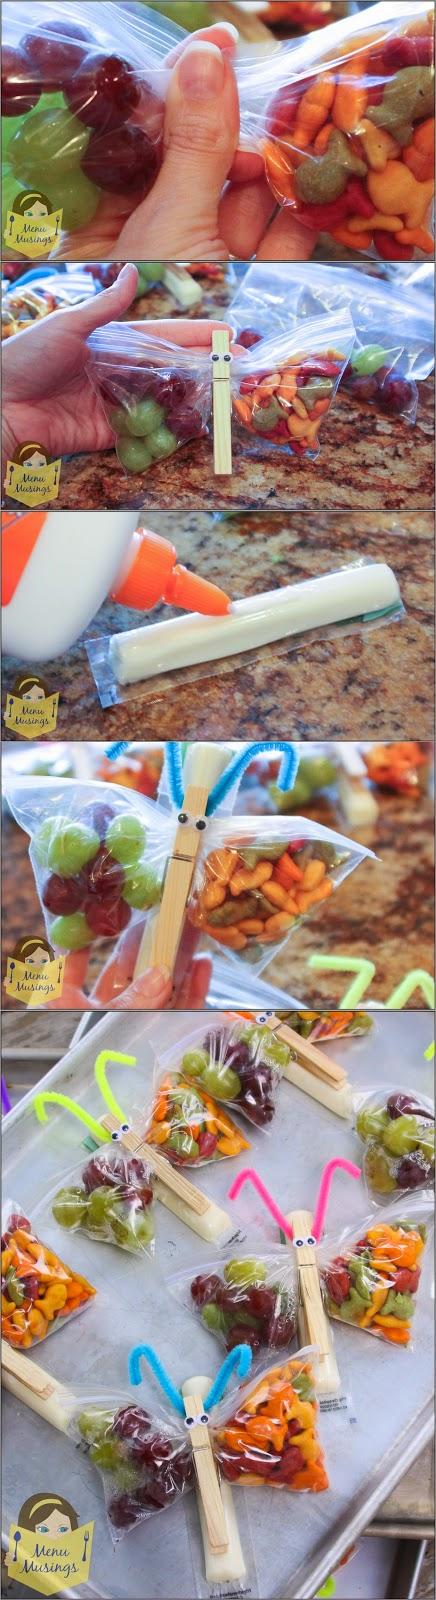 http://menumusings.blogspot.com/2014/08/butterfly-snack-bags.html